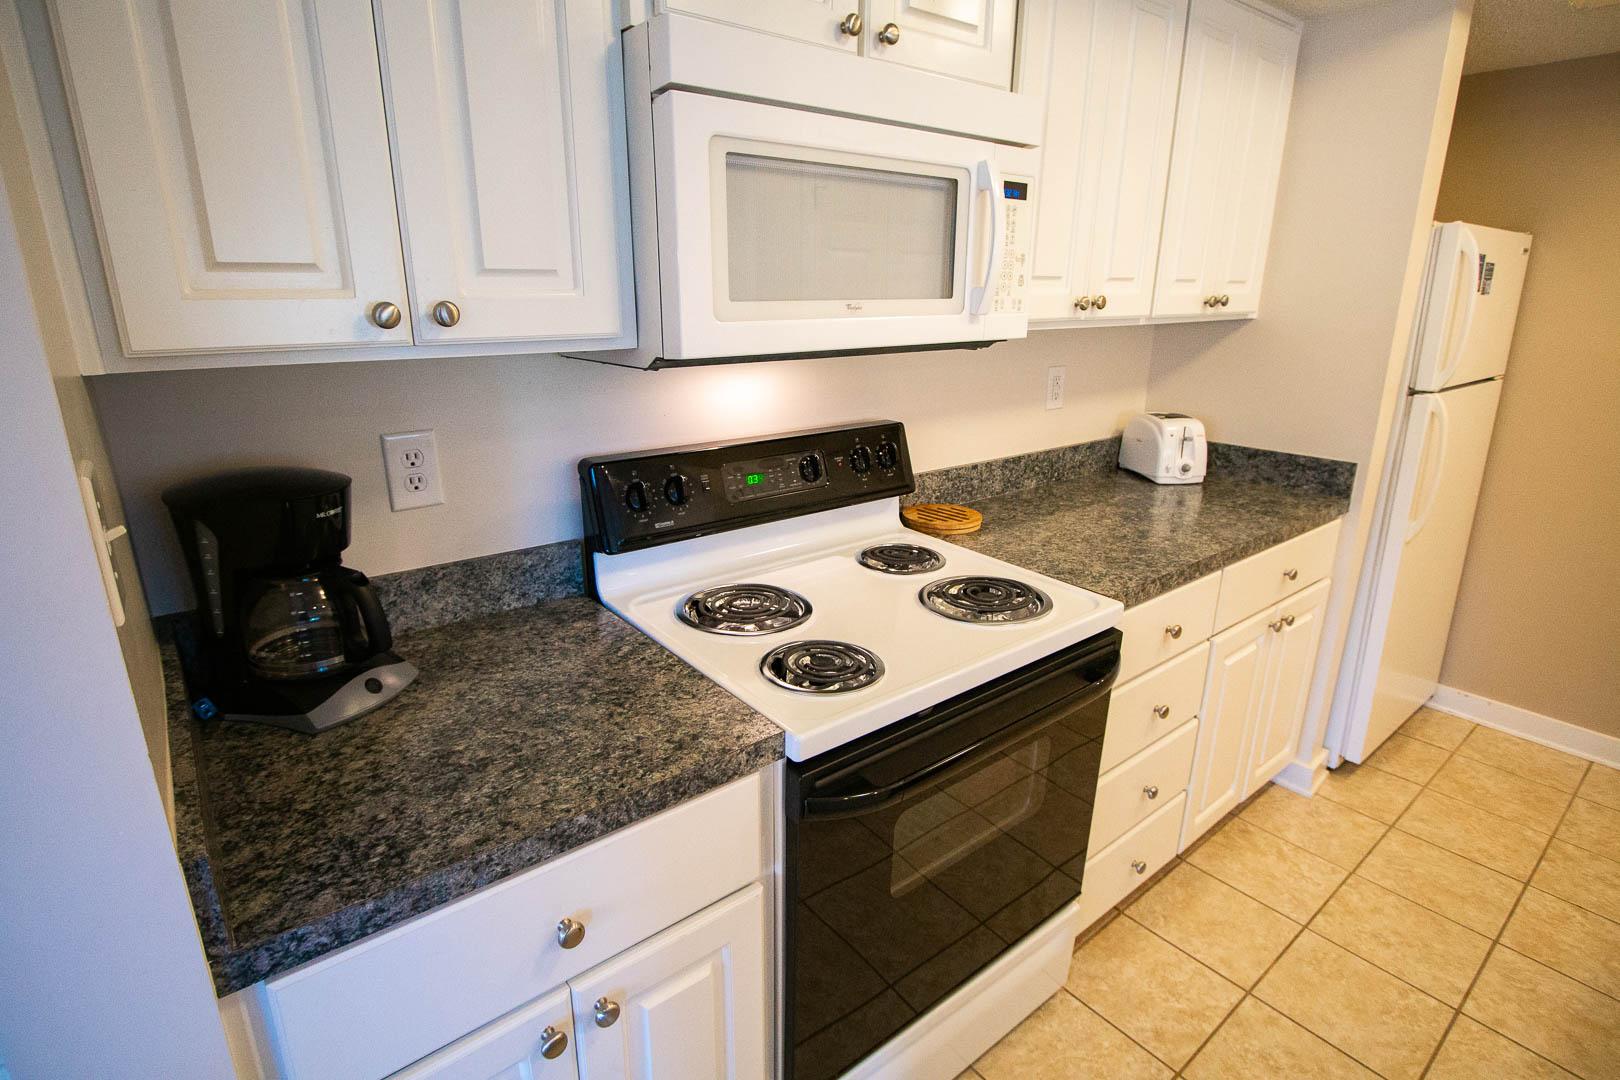 A clean kitchen at VRI's Sandcastle Village in New Bern, North Carolina.